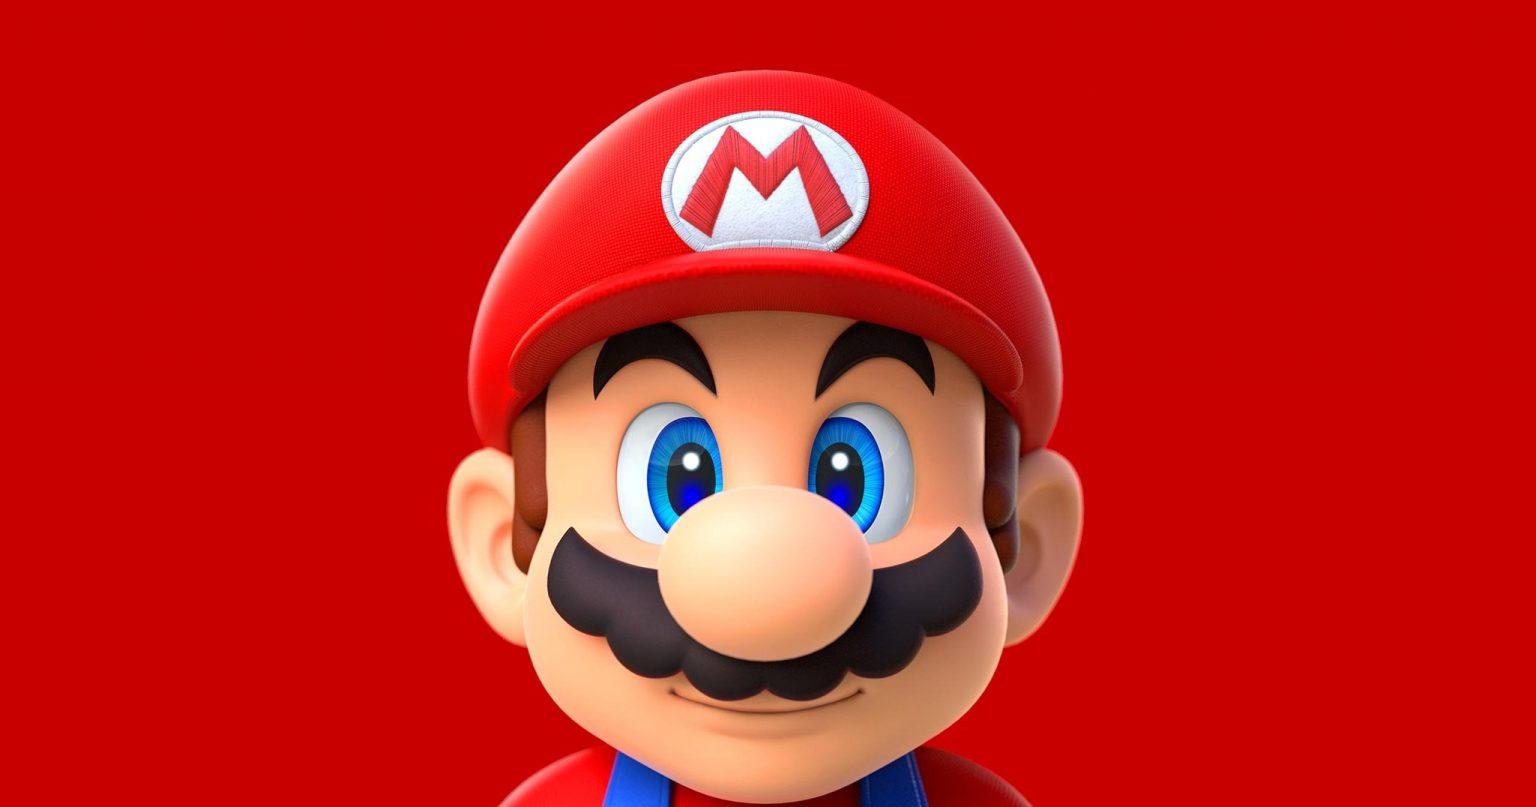 Gaji Rata-Rata Karyawan Nintendo Jepang Sekitar 105 Juta ...